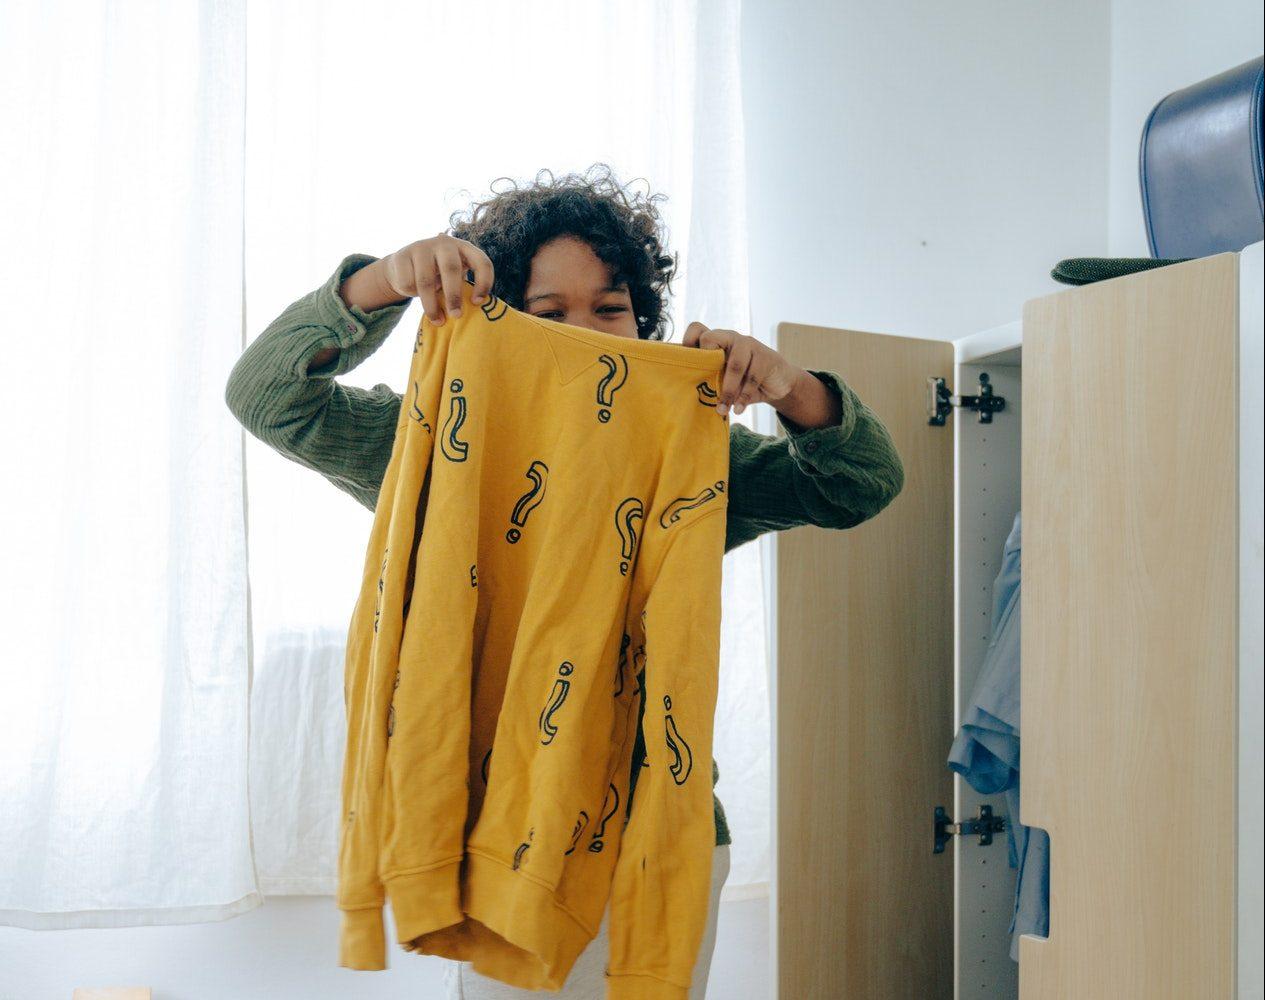 Une adolescente entrain d'arranger sa chambre